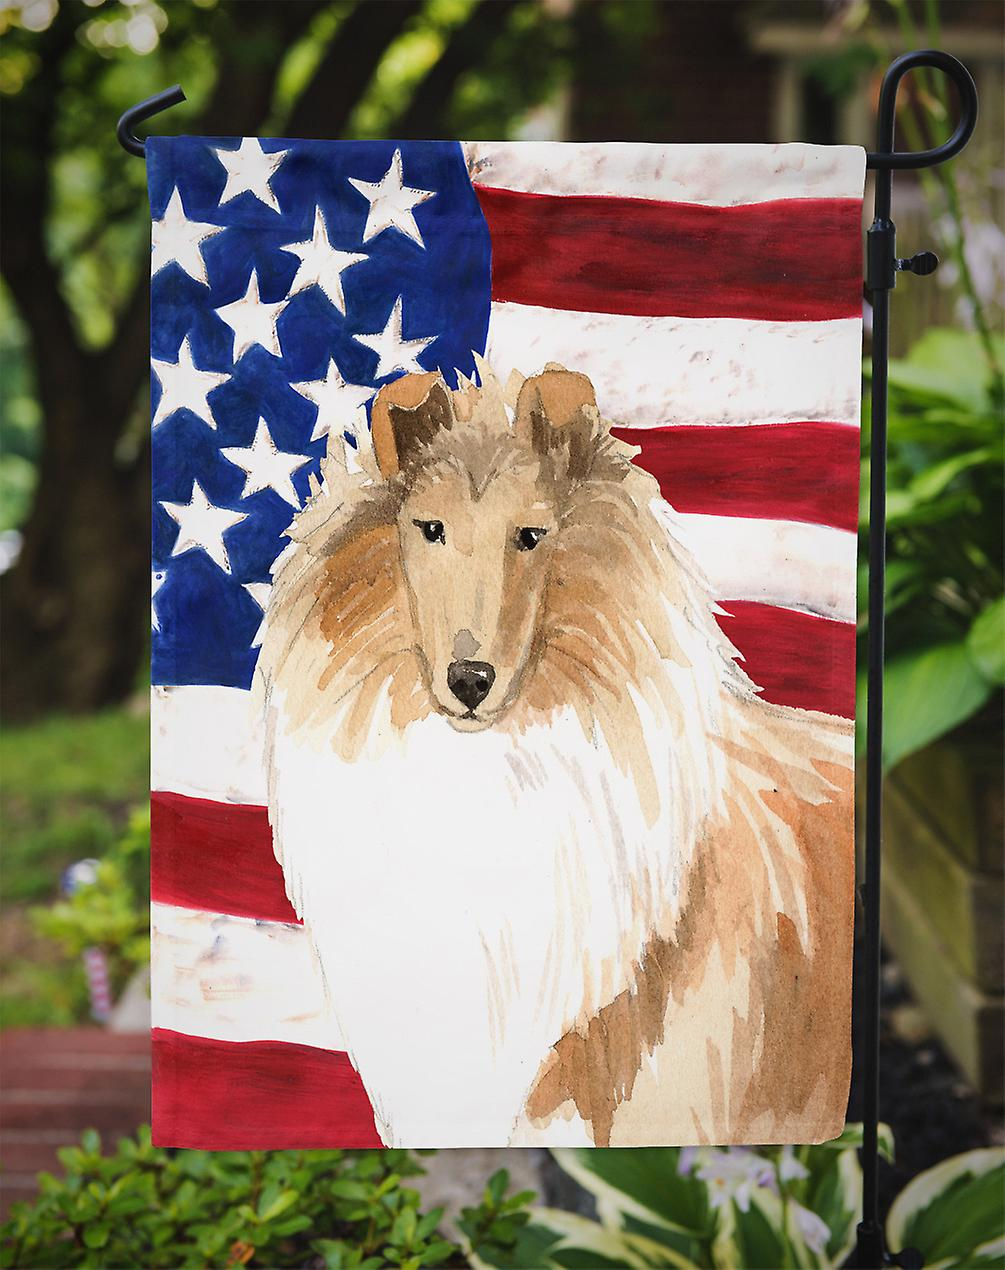 Carolines Treasures  CK1719GF Patriotic USA Rough Collie Flag Garden Size